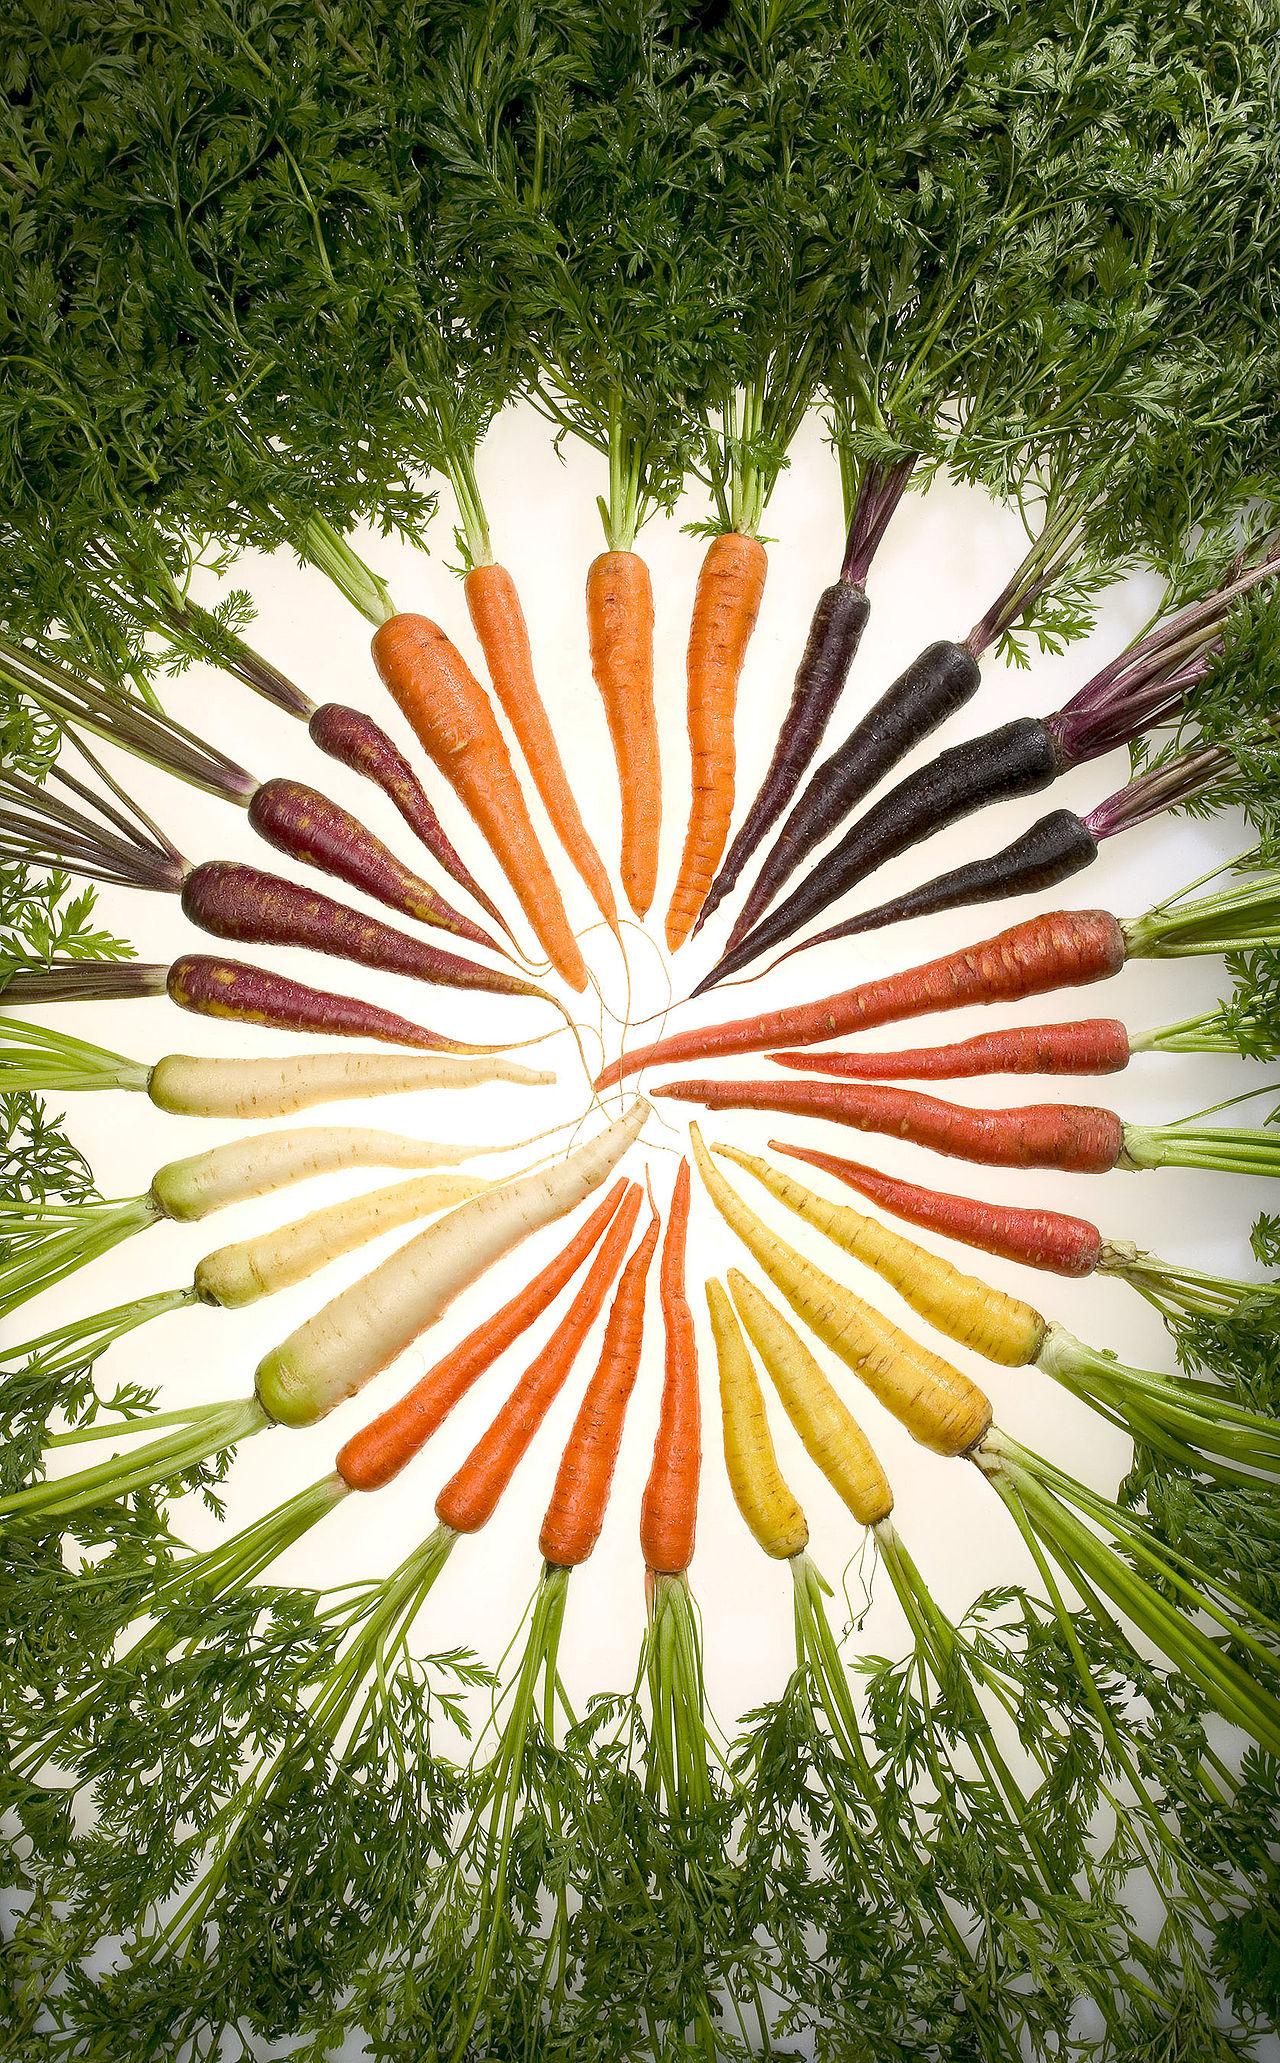 Colorful carrots! (Photo courtesy of Wikipedia)